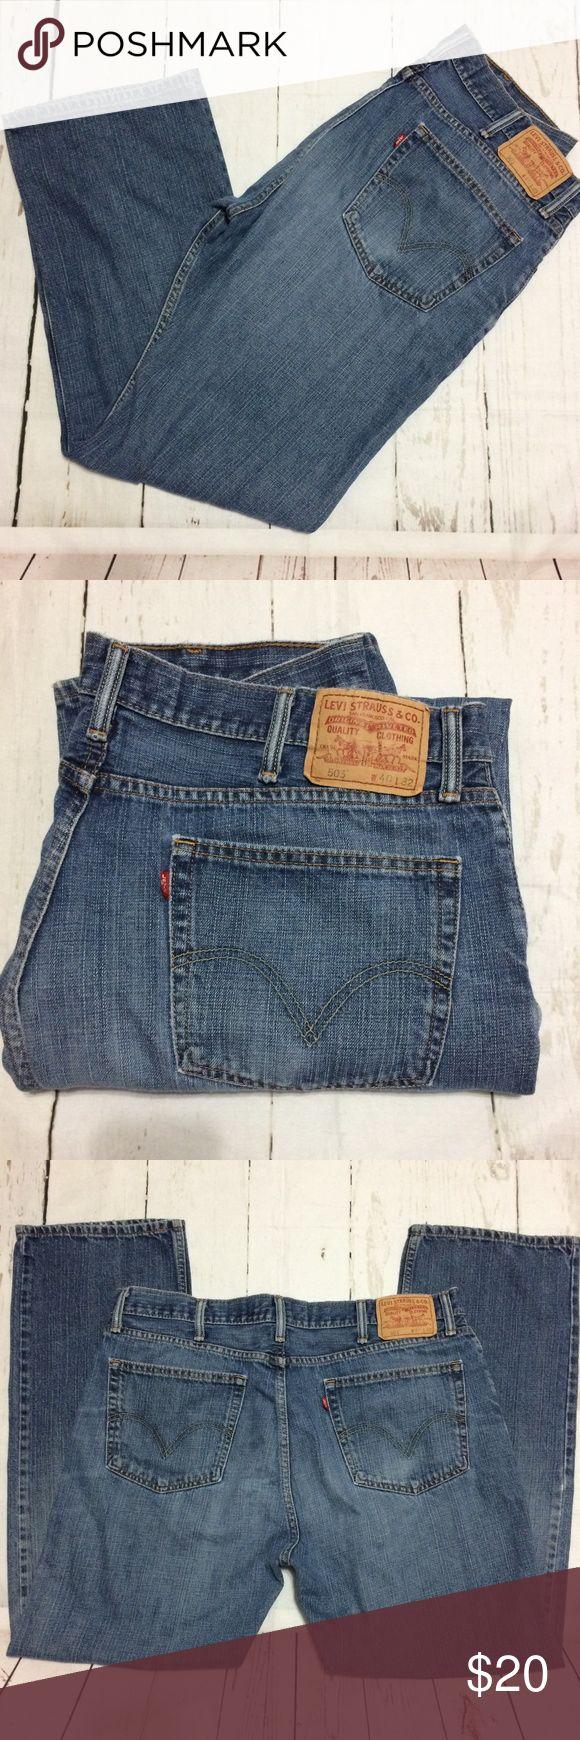 "*Final Price* Men's Levis 505 Jeans 40x32 Men's Levis 505 Jeans 40x32. Straight Fit Jeans Manufactured Distressed Waist  40"" Inseam 32"" Levi's Jeans Straight"